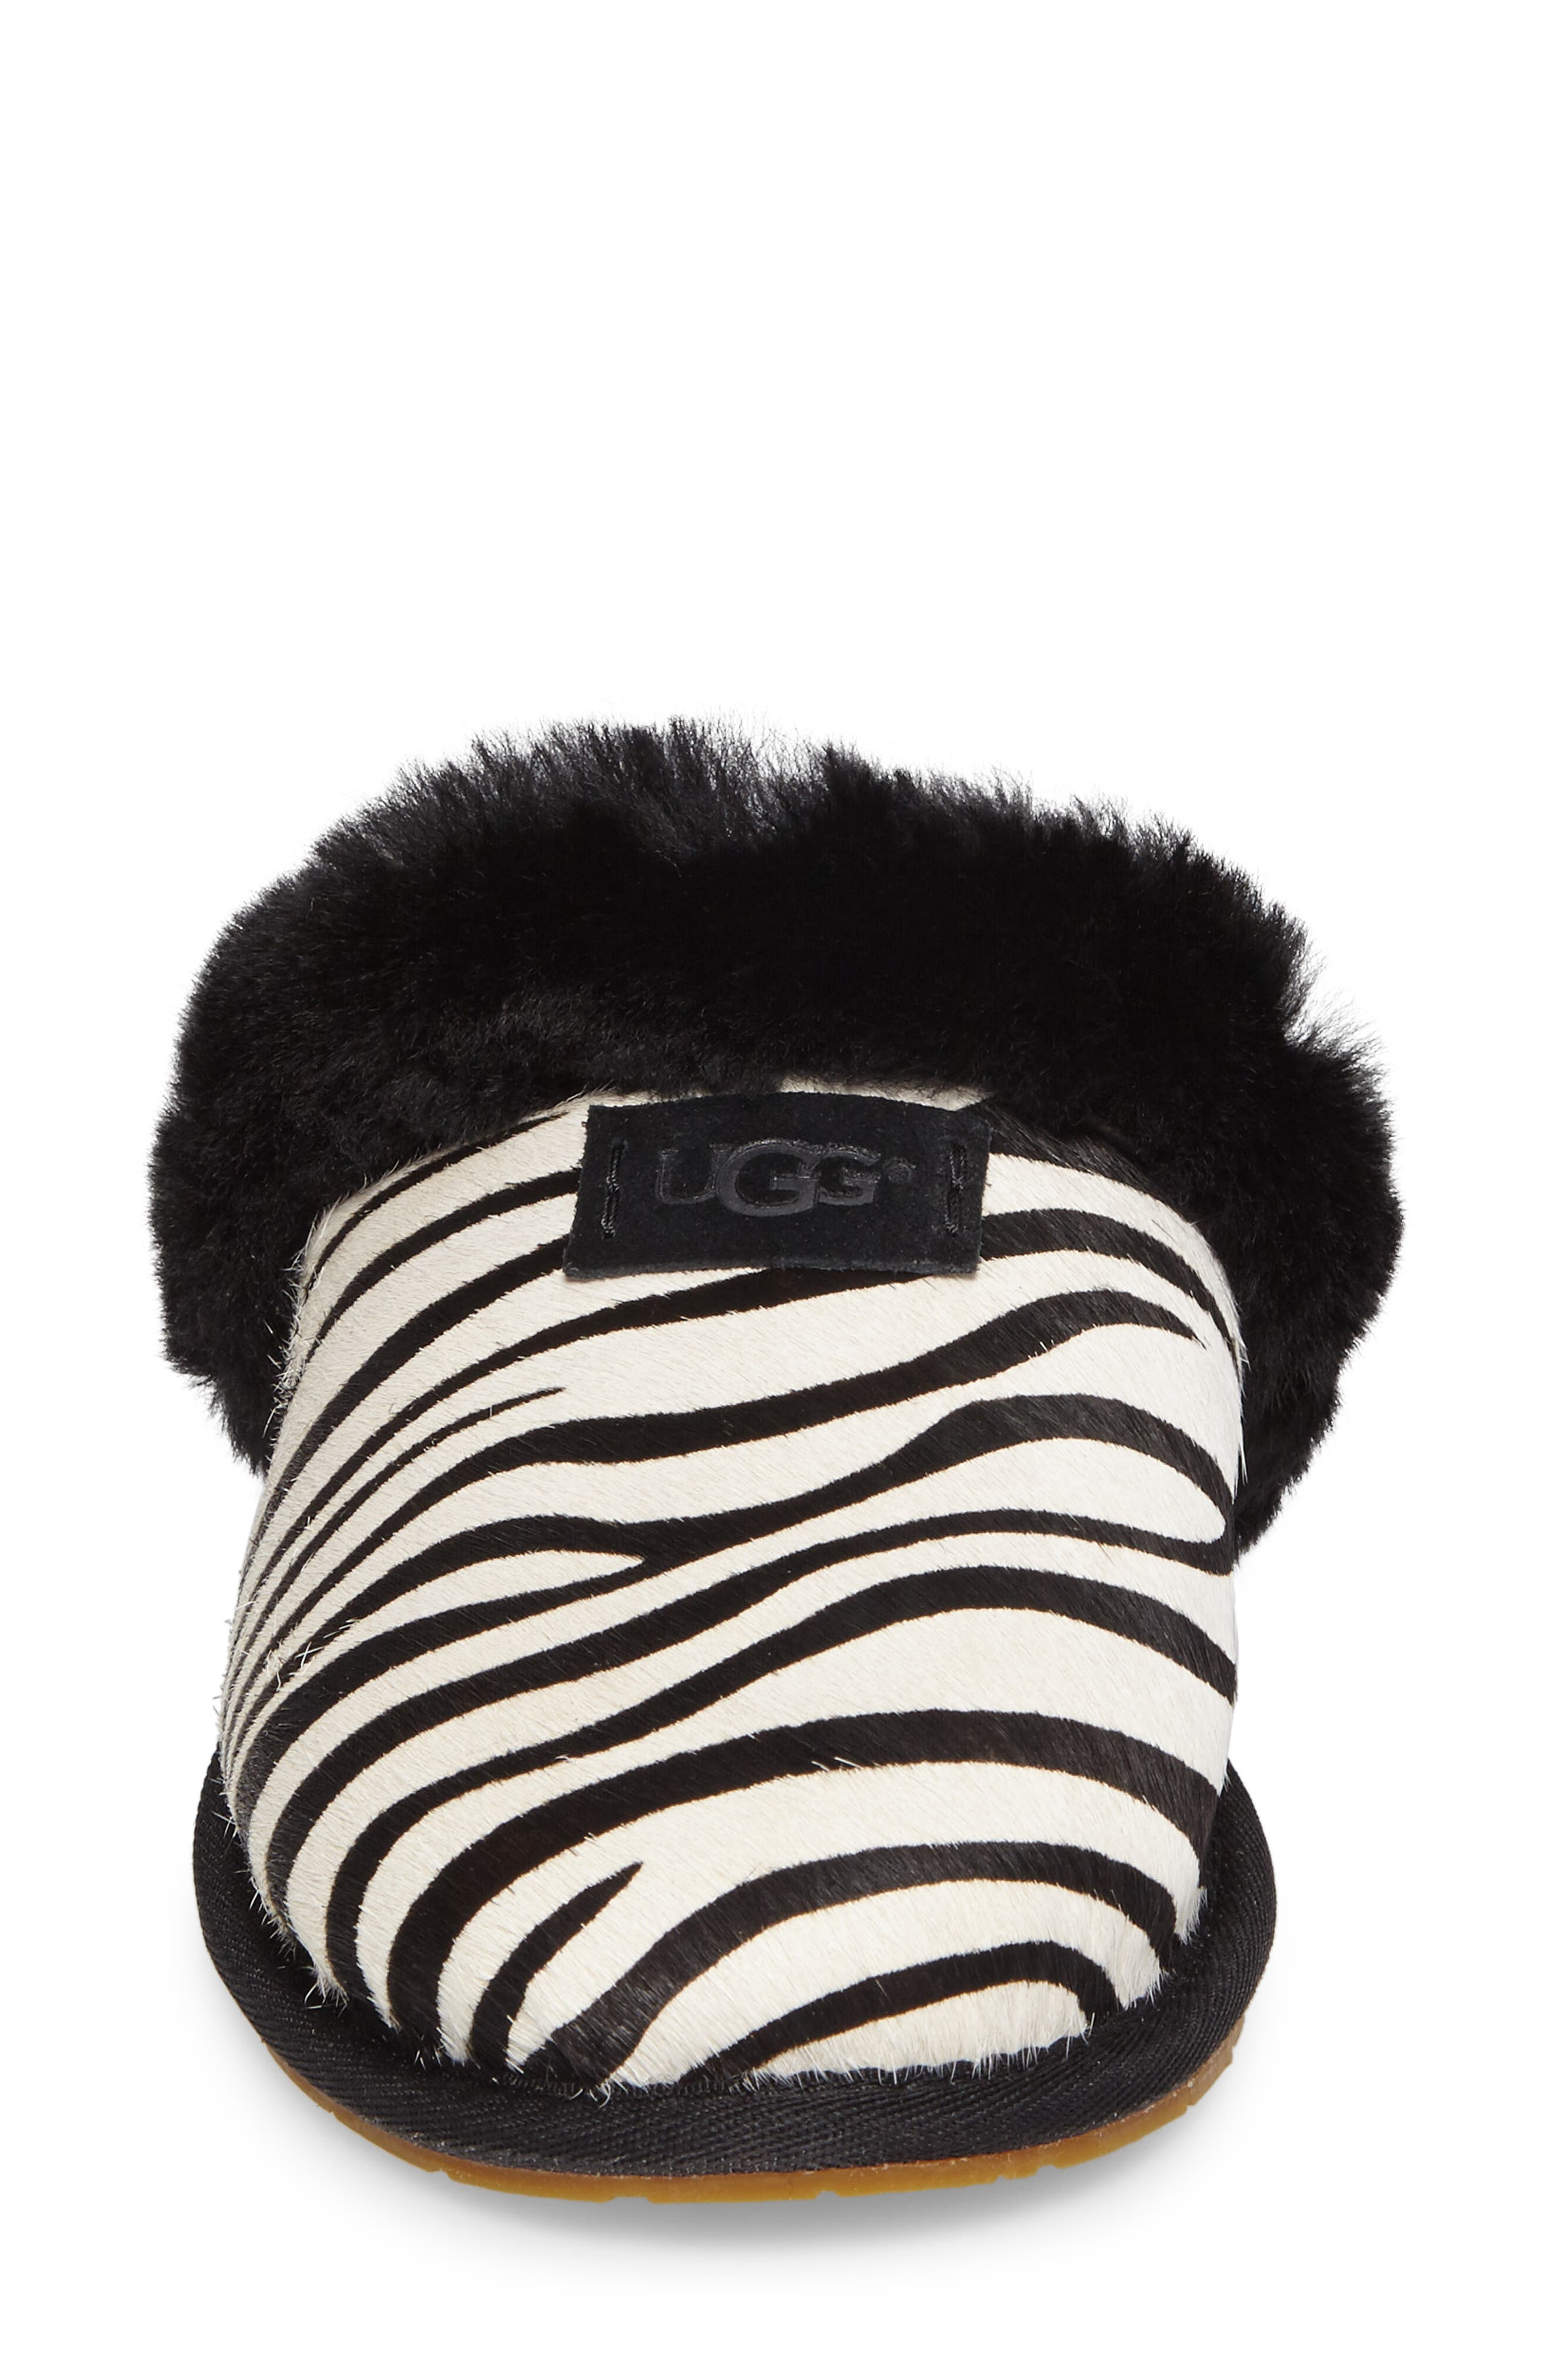 Australia Scuffette II - Exotic Genuine Calf Hair Slipper,                             Alternate thumbnail 16, color,